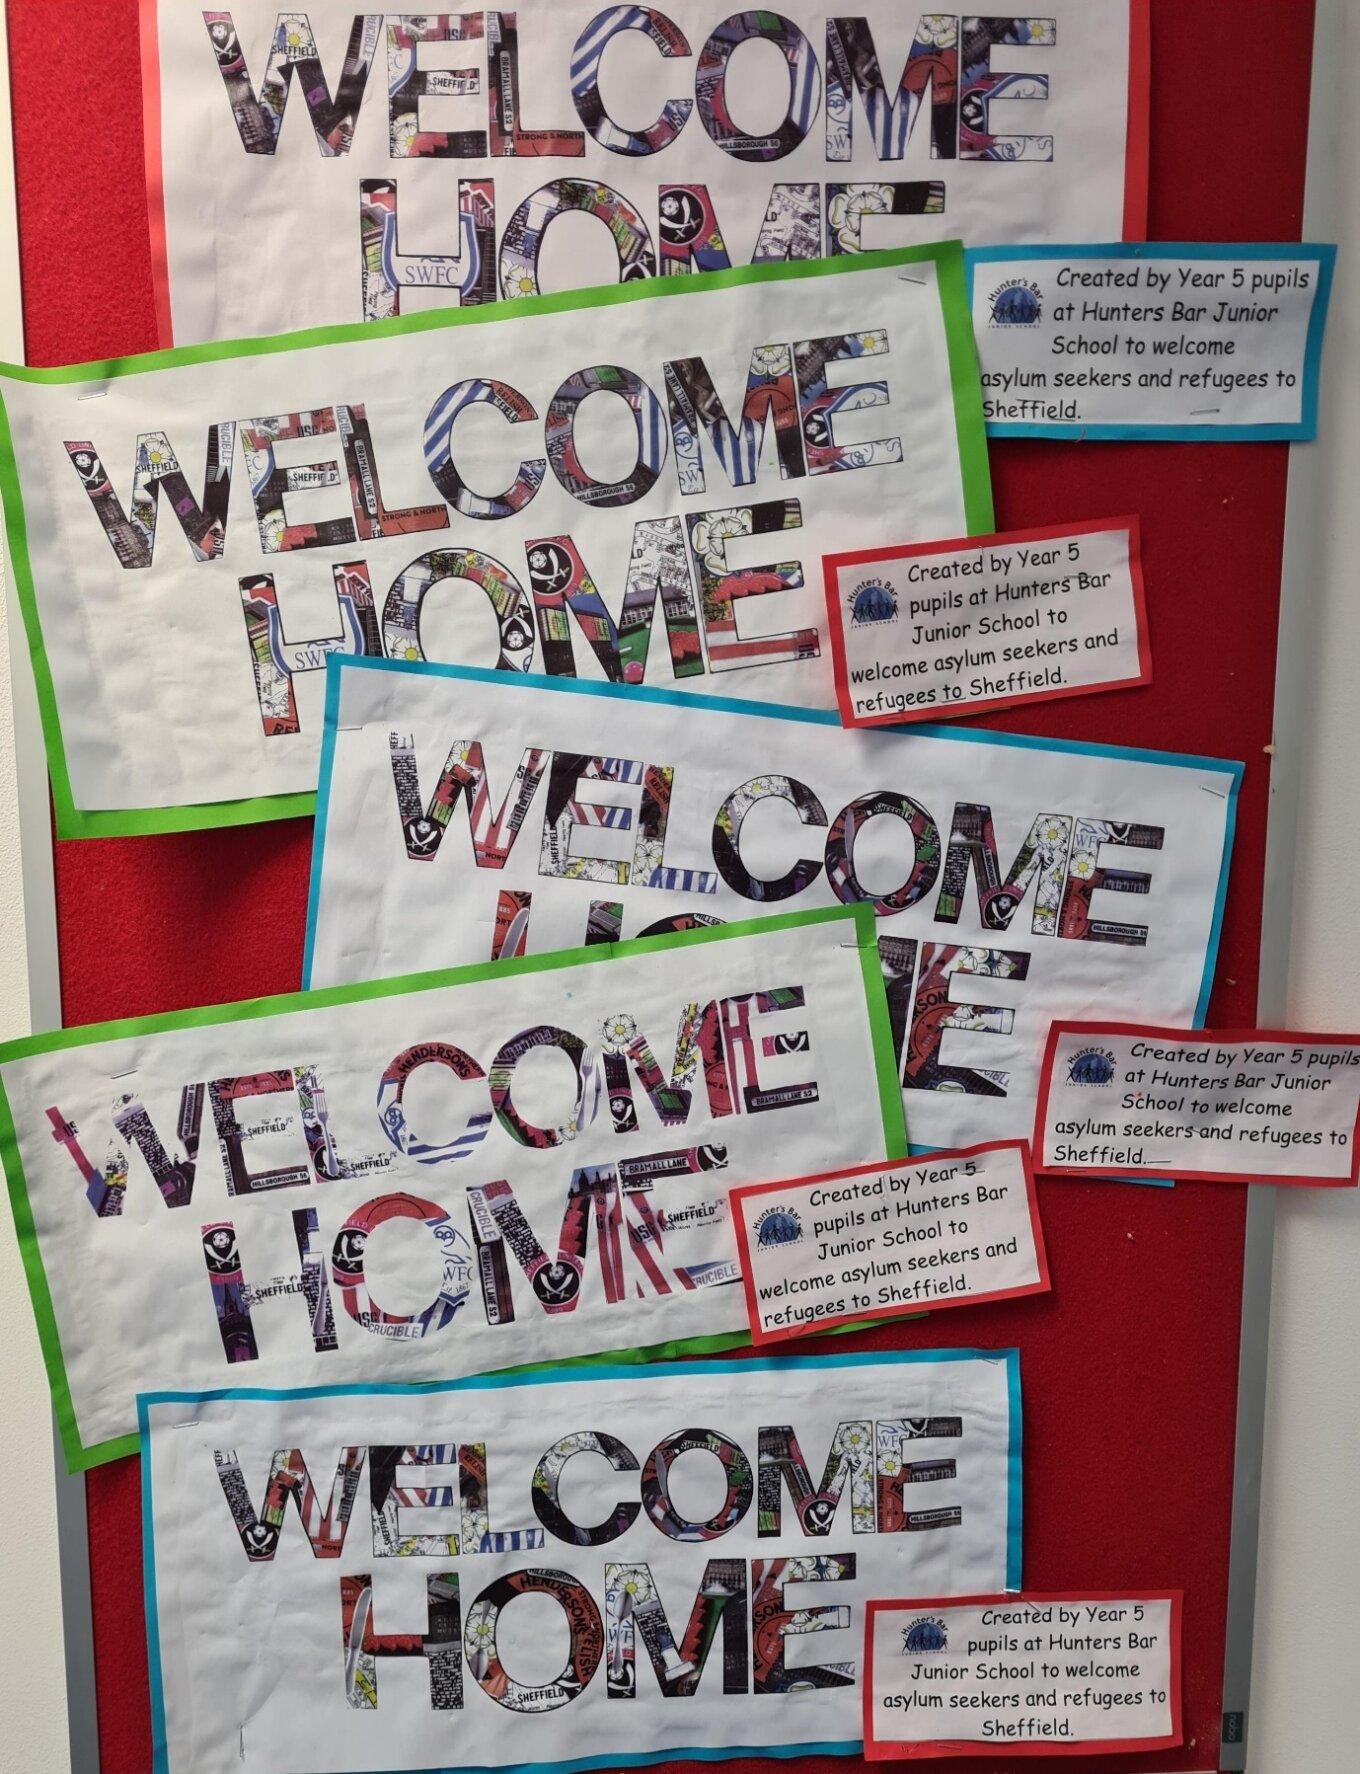 Welcomehome2